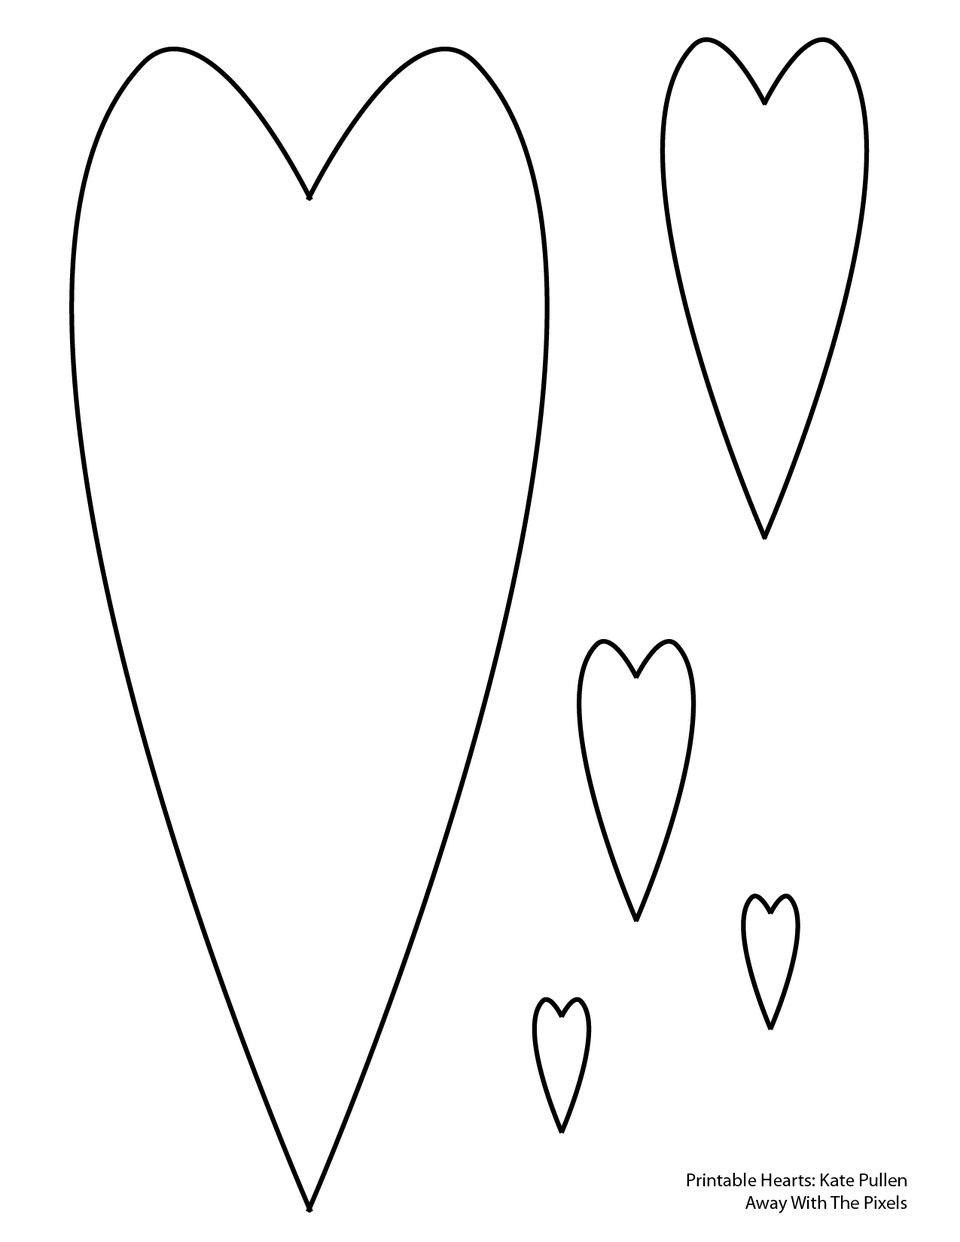 Free Printable Heart Templates Throughout Free Printable Heart Templates